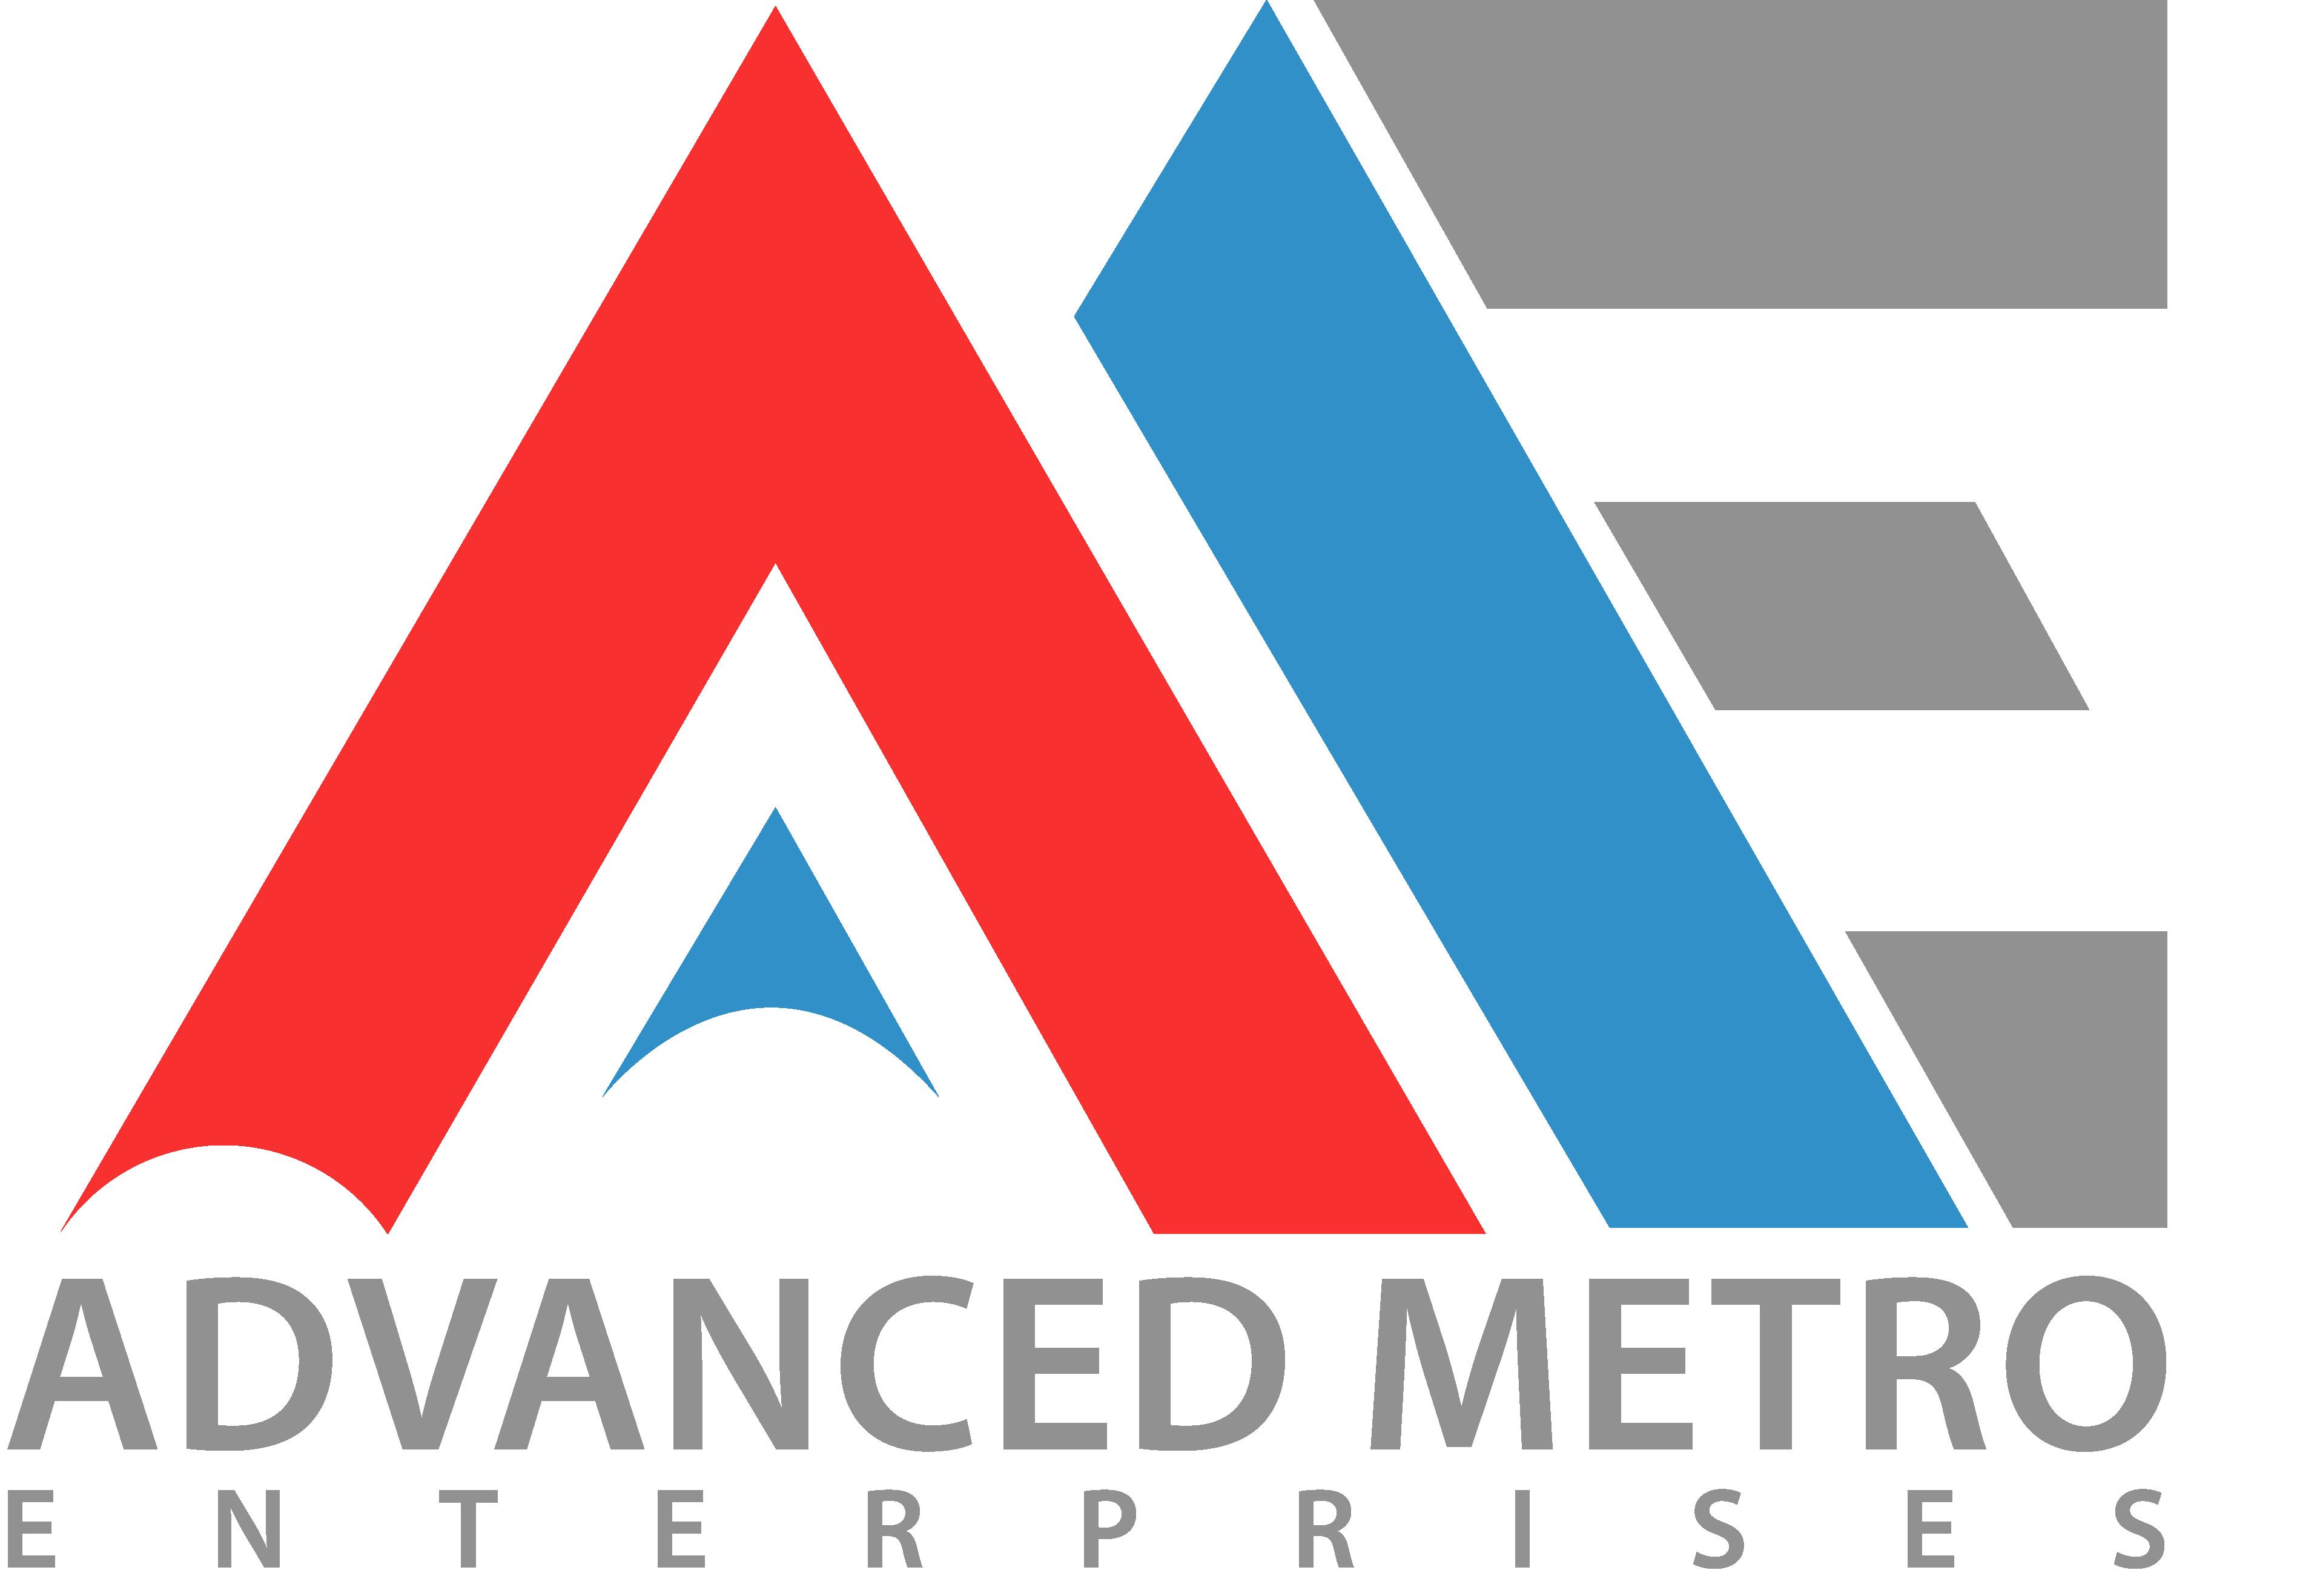 Advance Metro